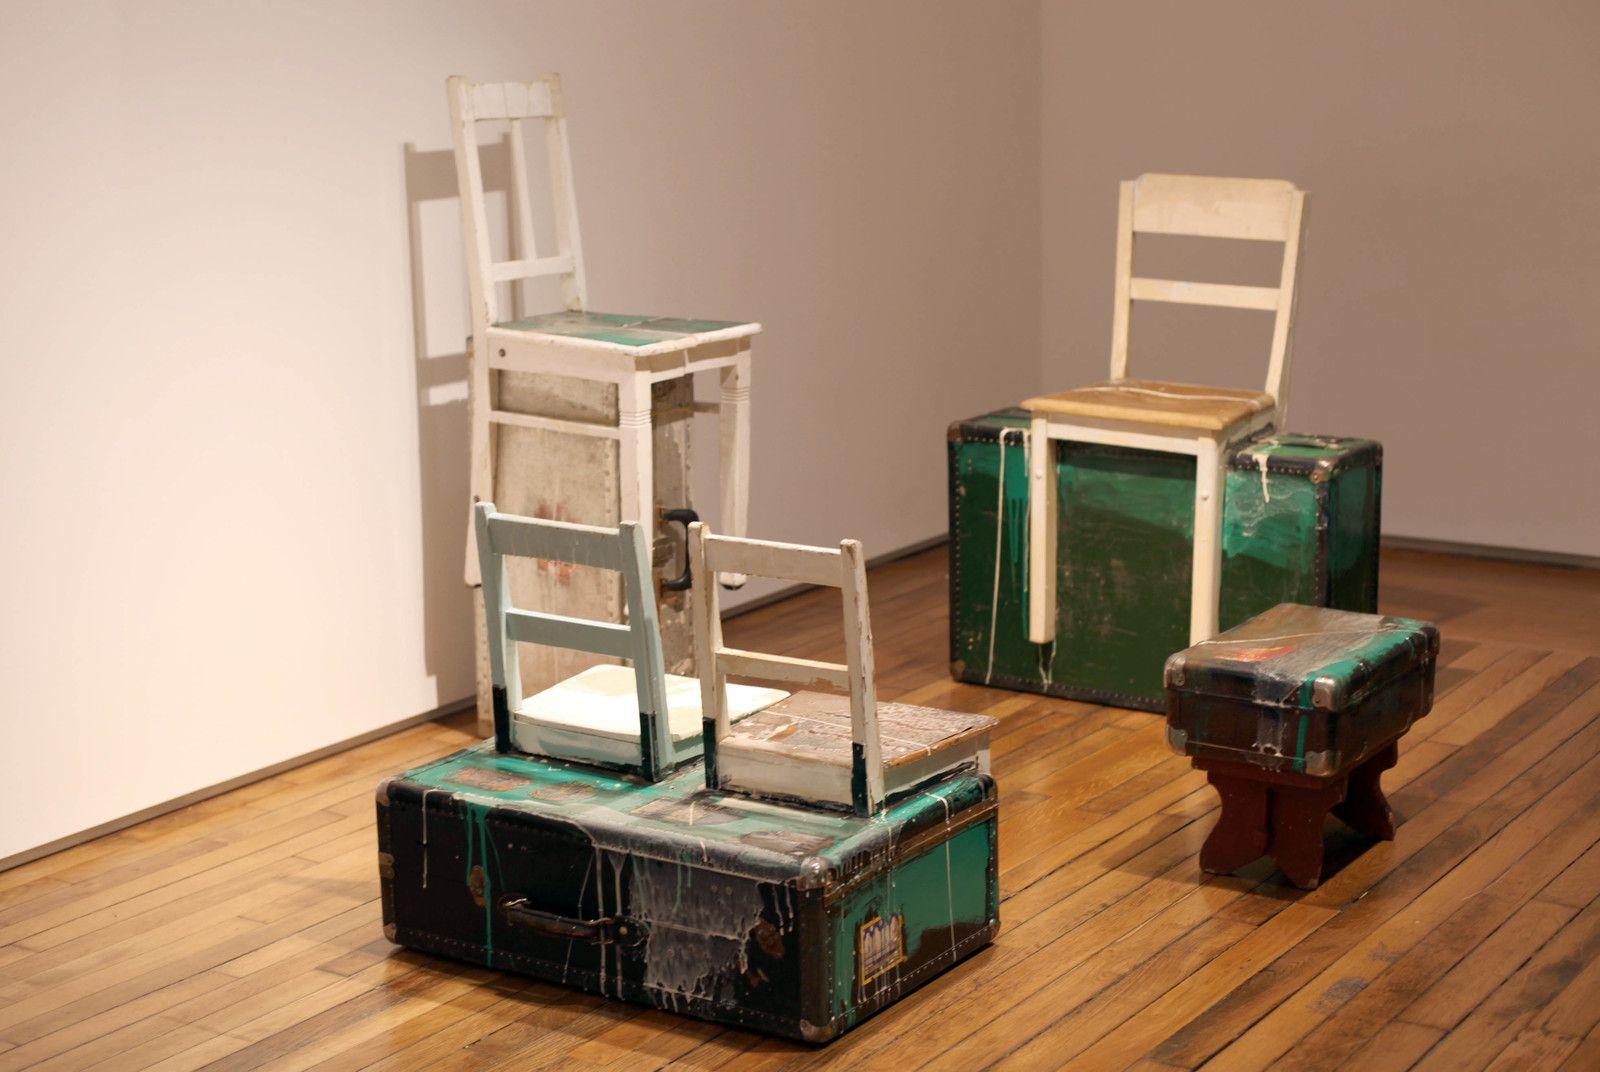 """Useful Art N°4: Suitcase Family"", 1992 de Edward & Nancy KIENHOLZ - Courtesy Galerie Templon © Photo Éric Simon"